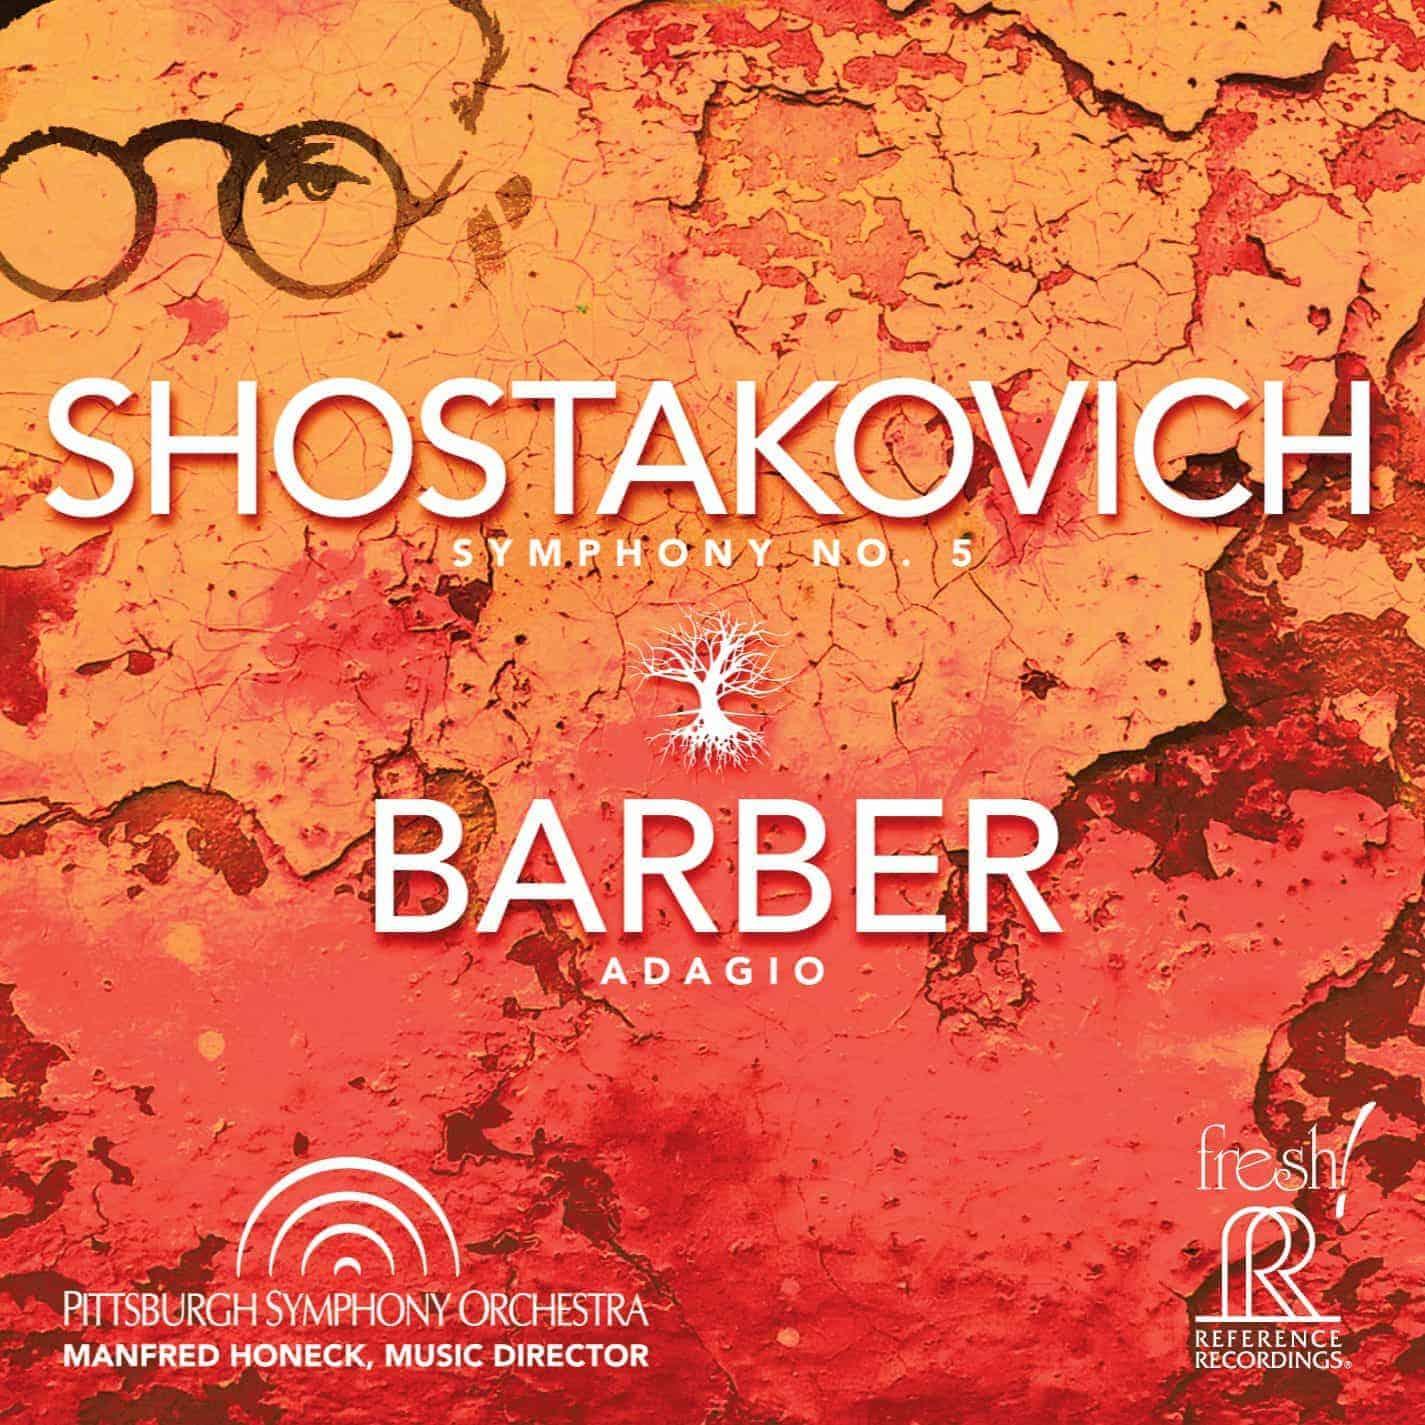 Shostakovich: Symphony No. 5 - Barber: Adagio for Strings